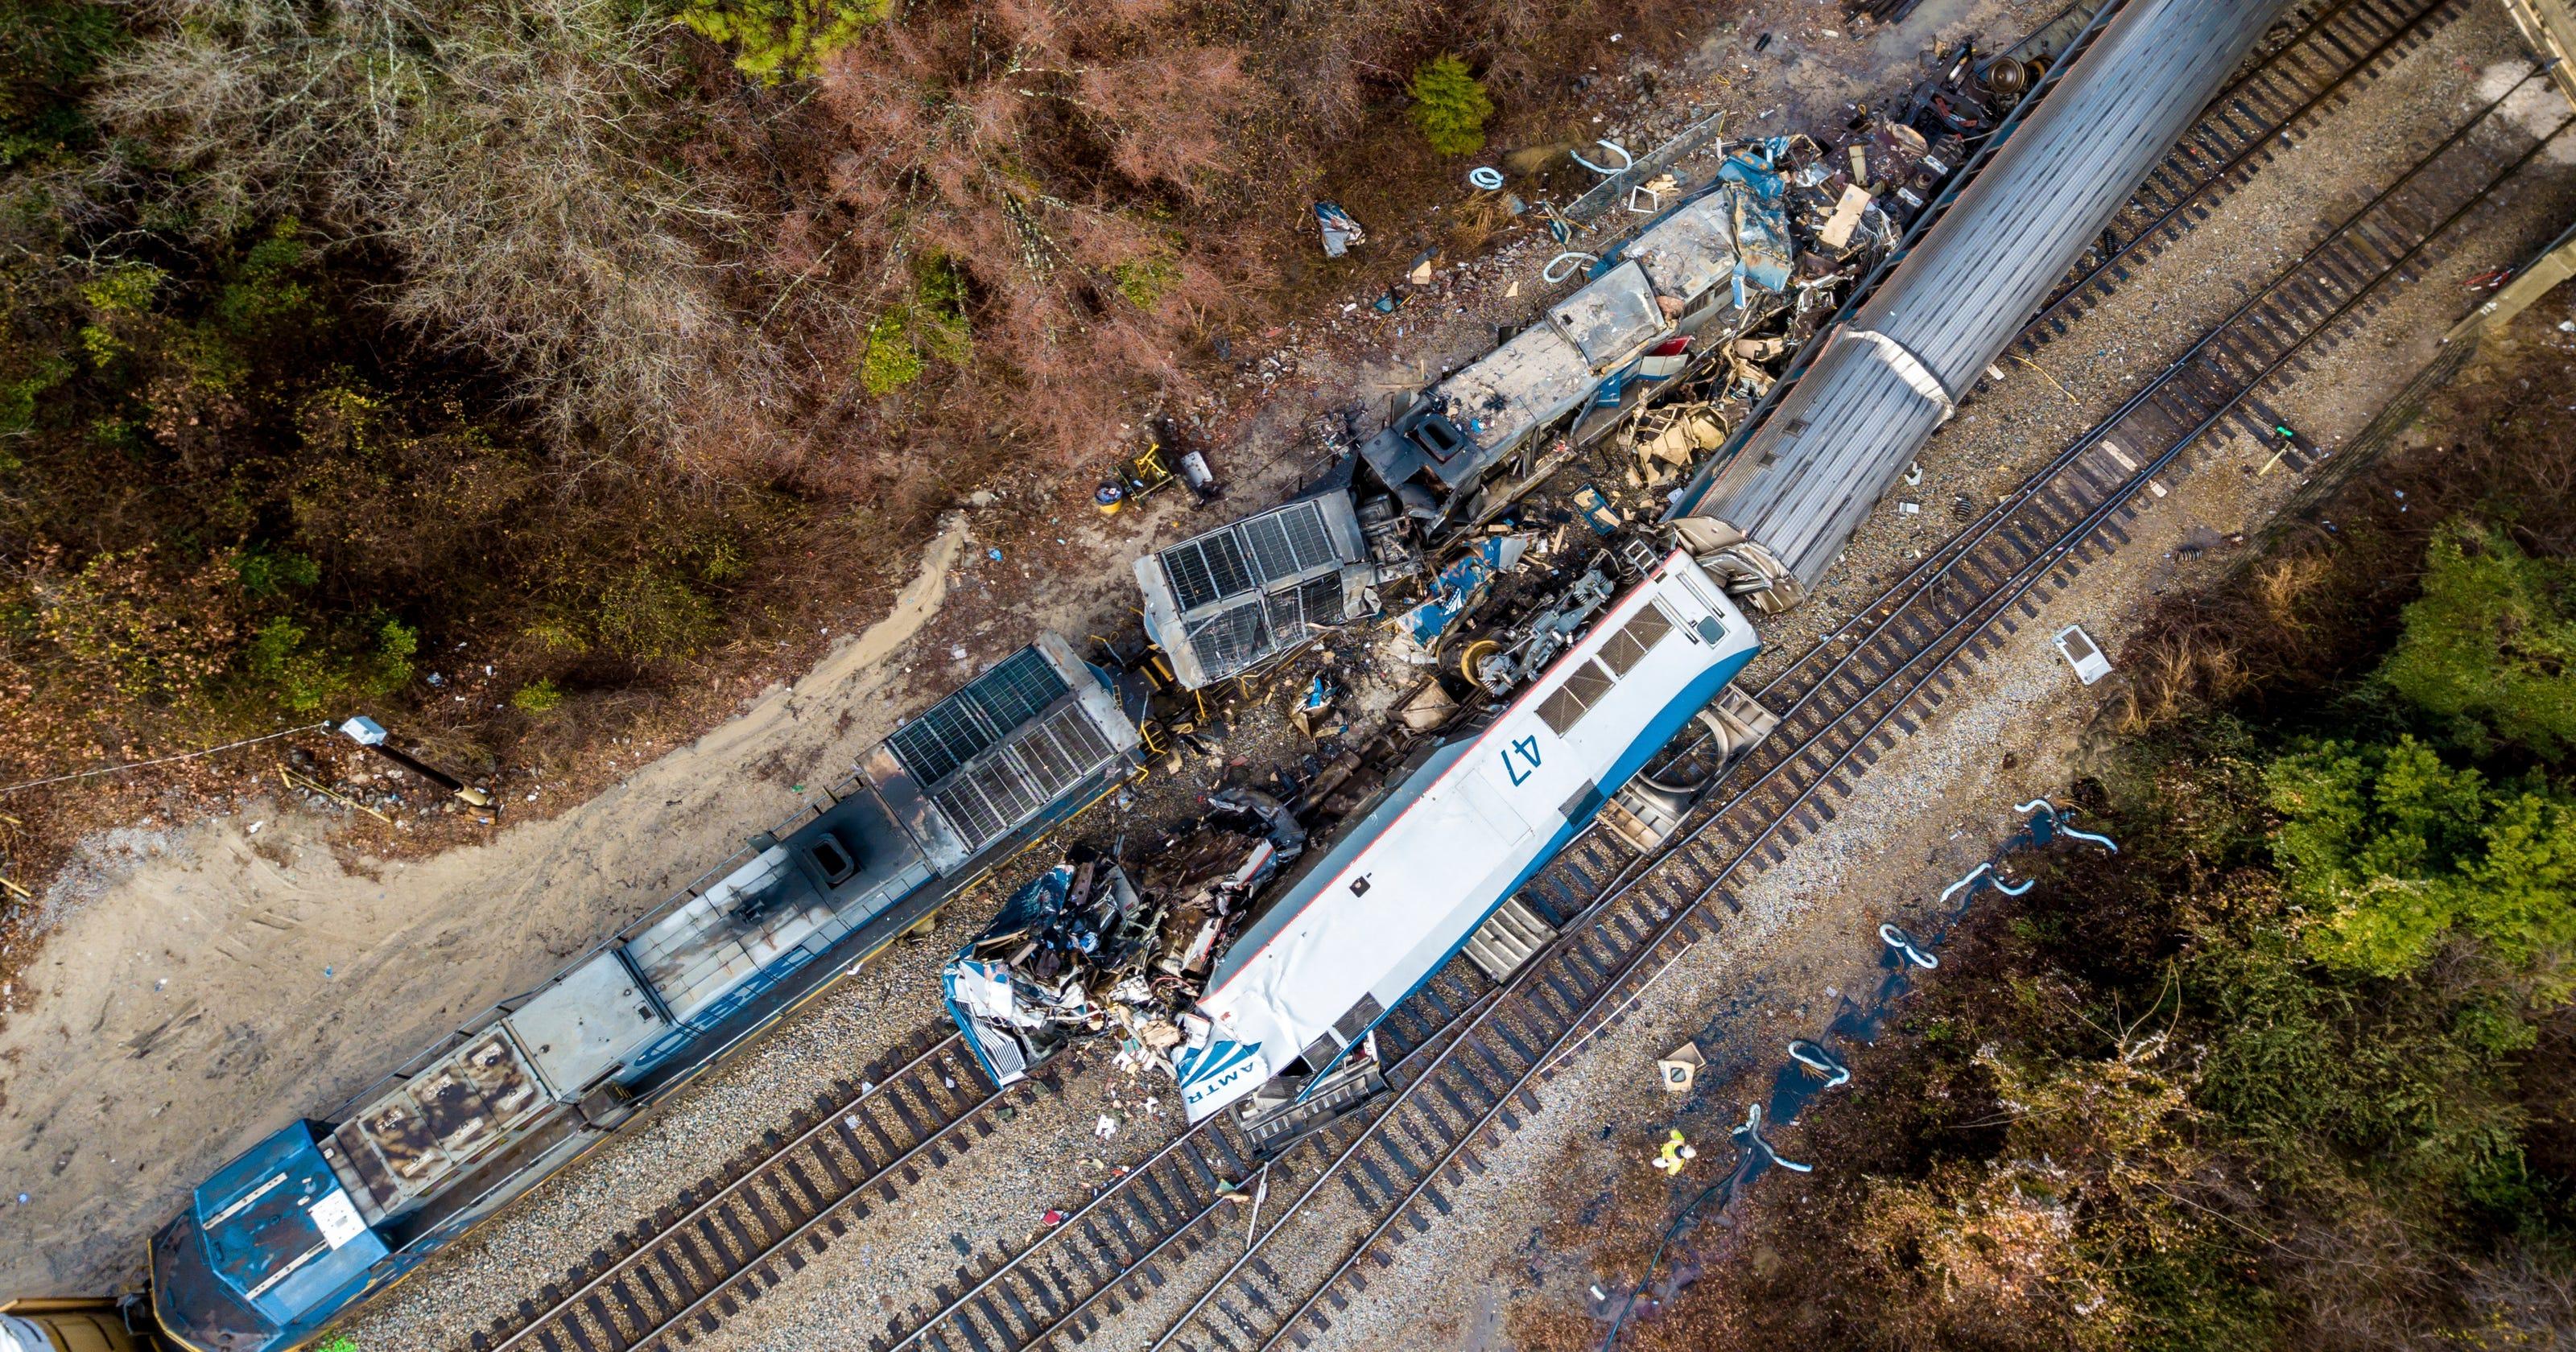 At least 2 dead, dozens injured in South Carolina train collision